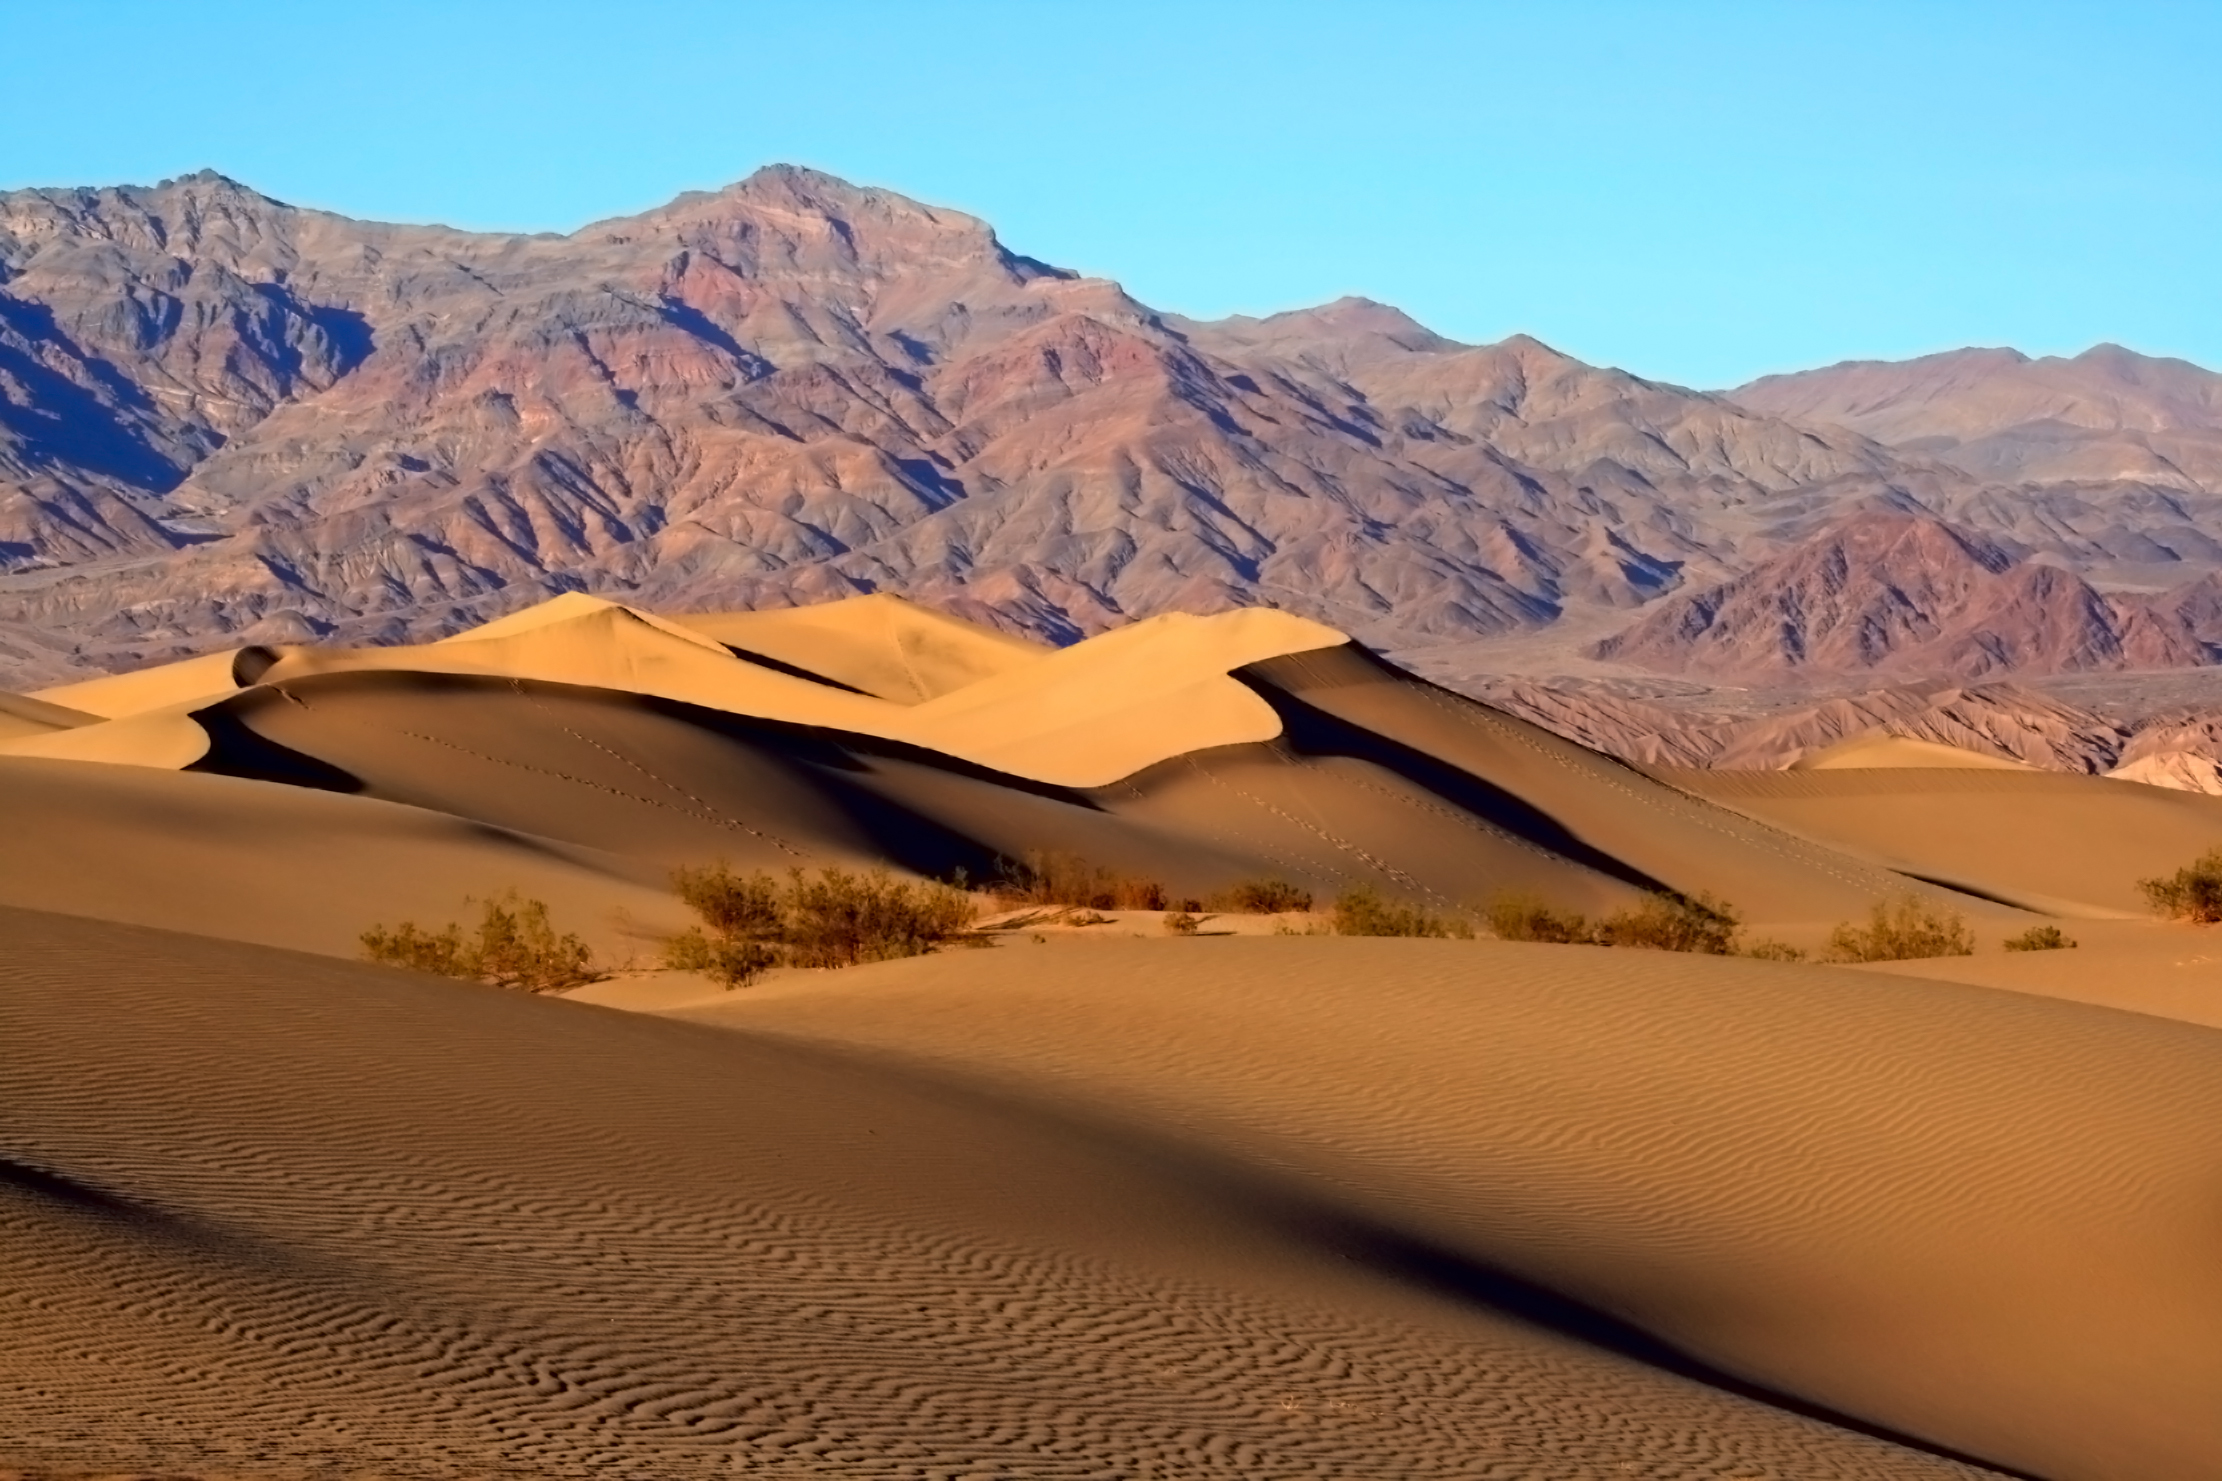 Sand Dunes File:Mesquite Sand Dun...